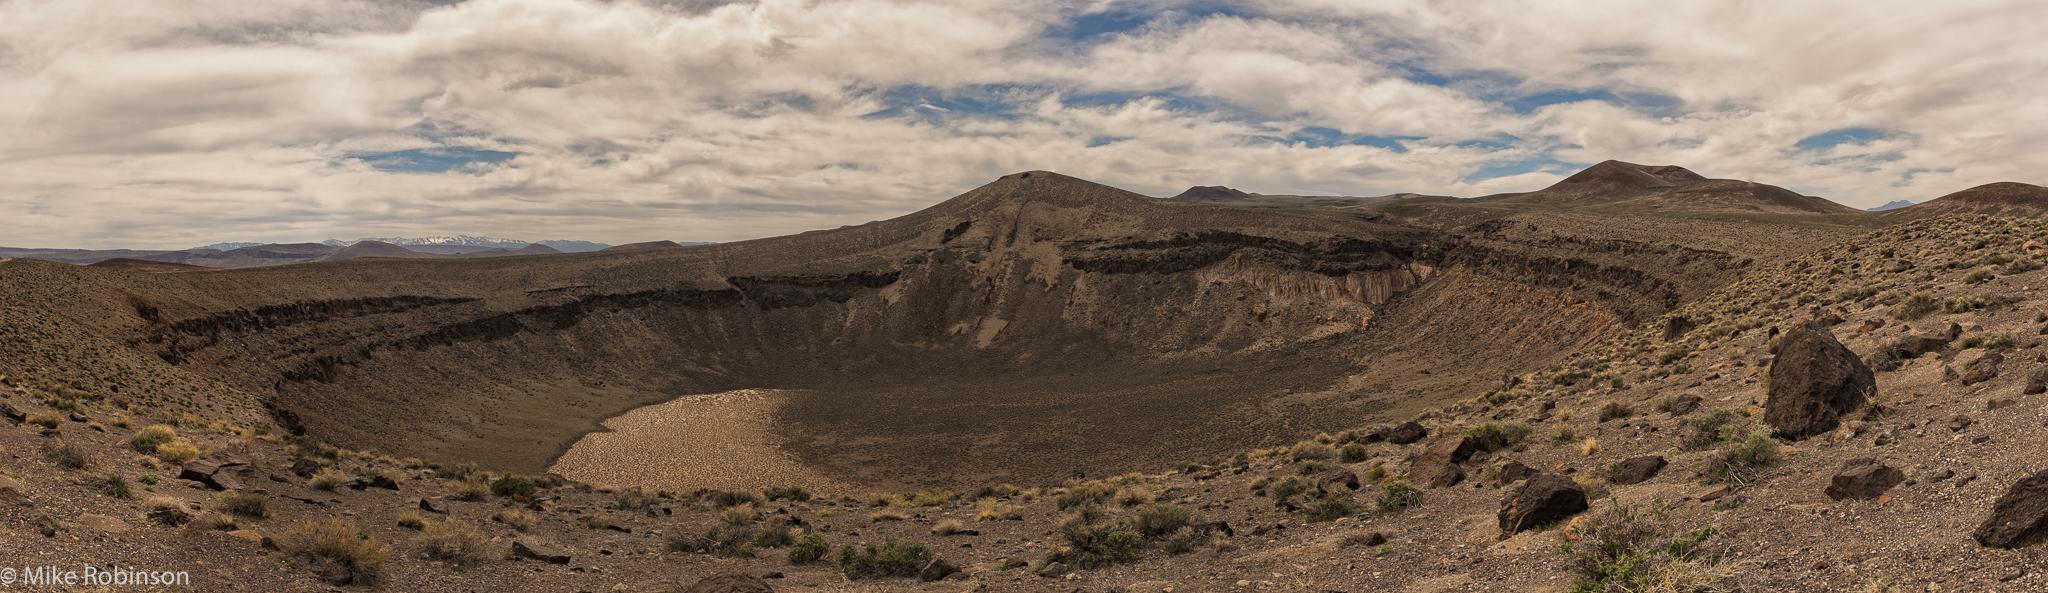 Lunar_Crater_1